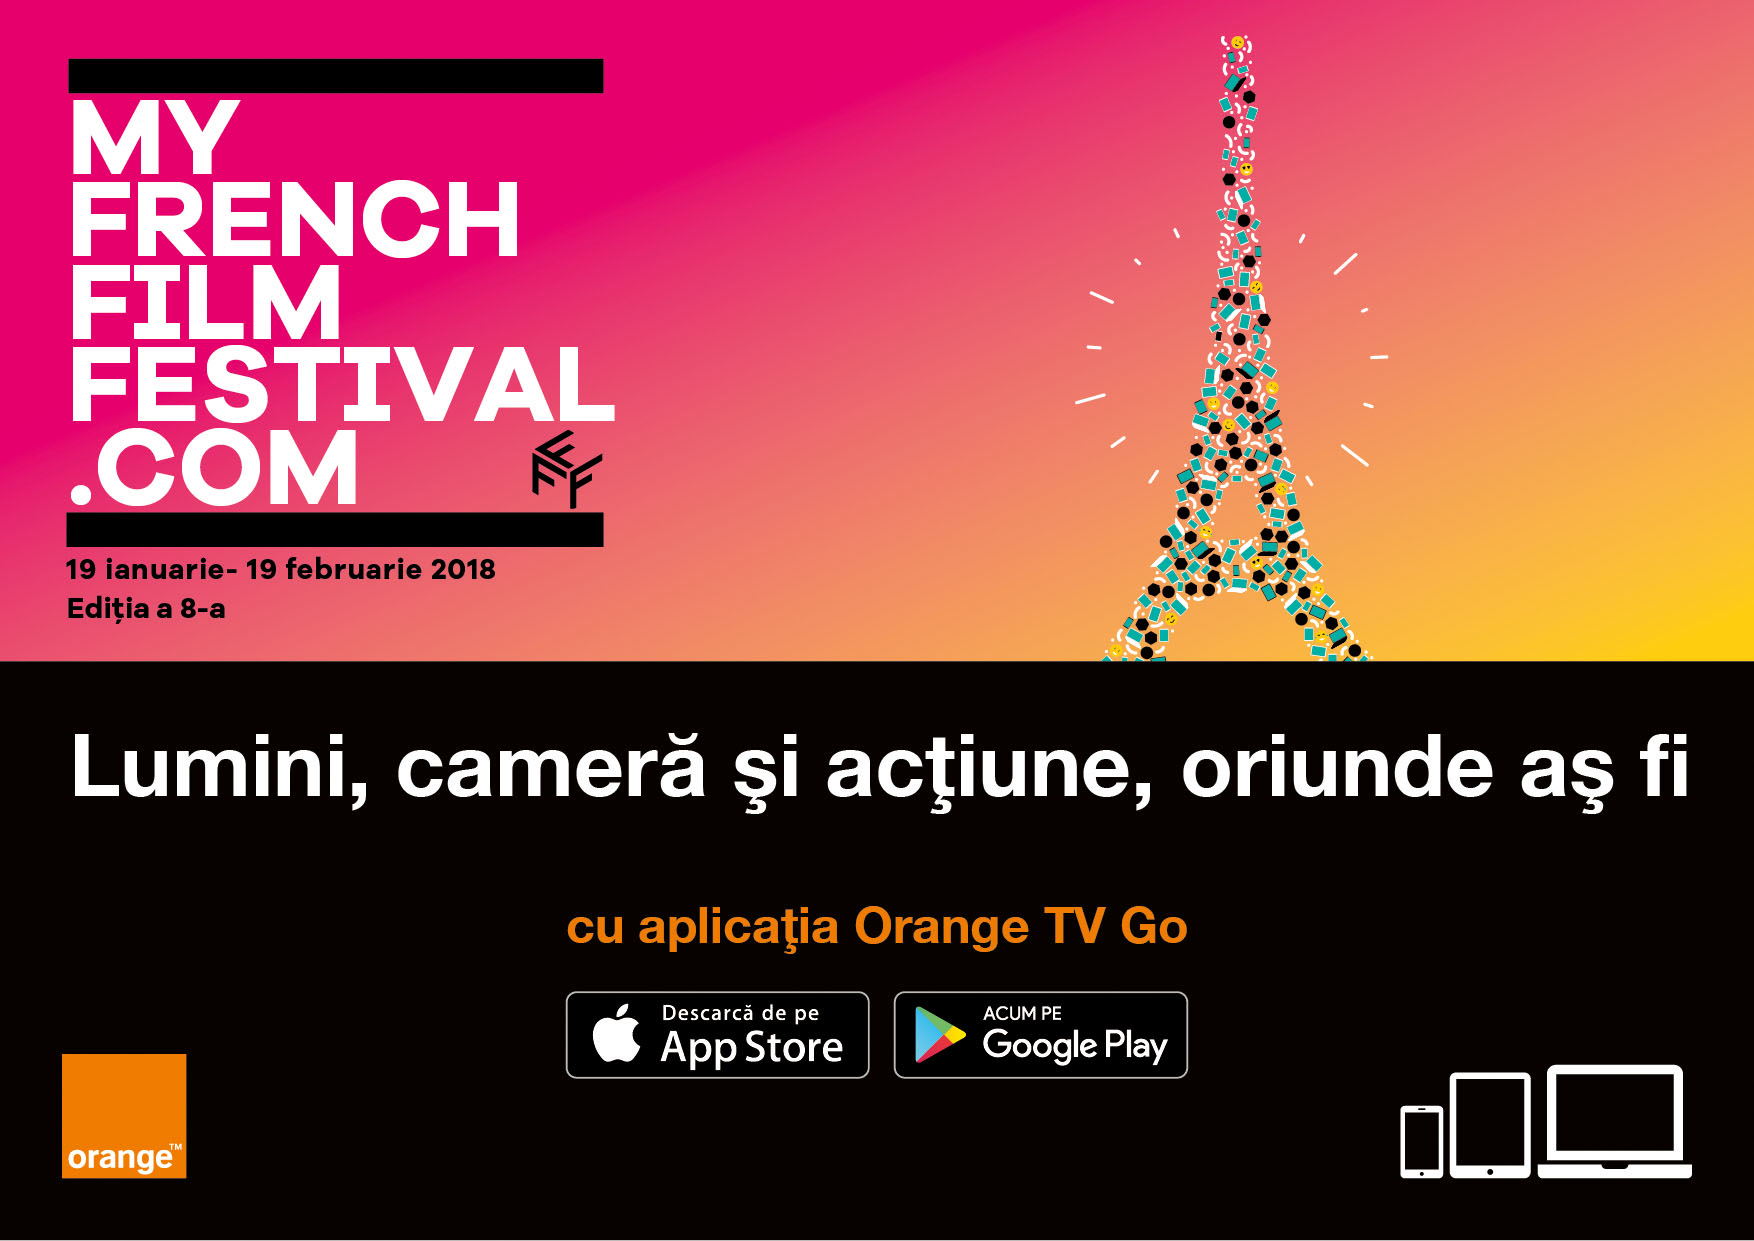 MyFrenchFilmFestival, festivalul online dedicat cinematografiei franceze, revine în România